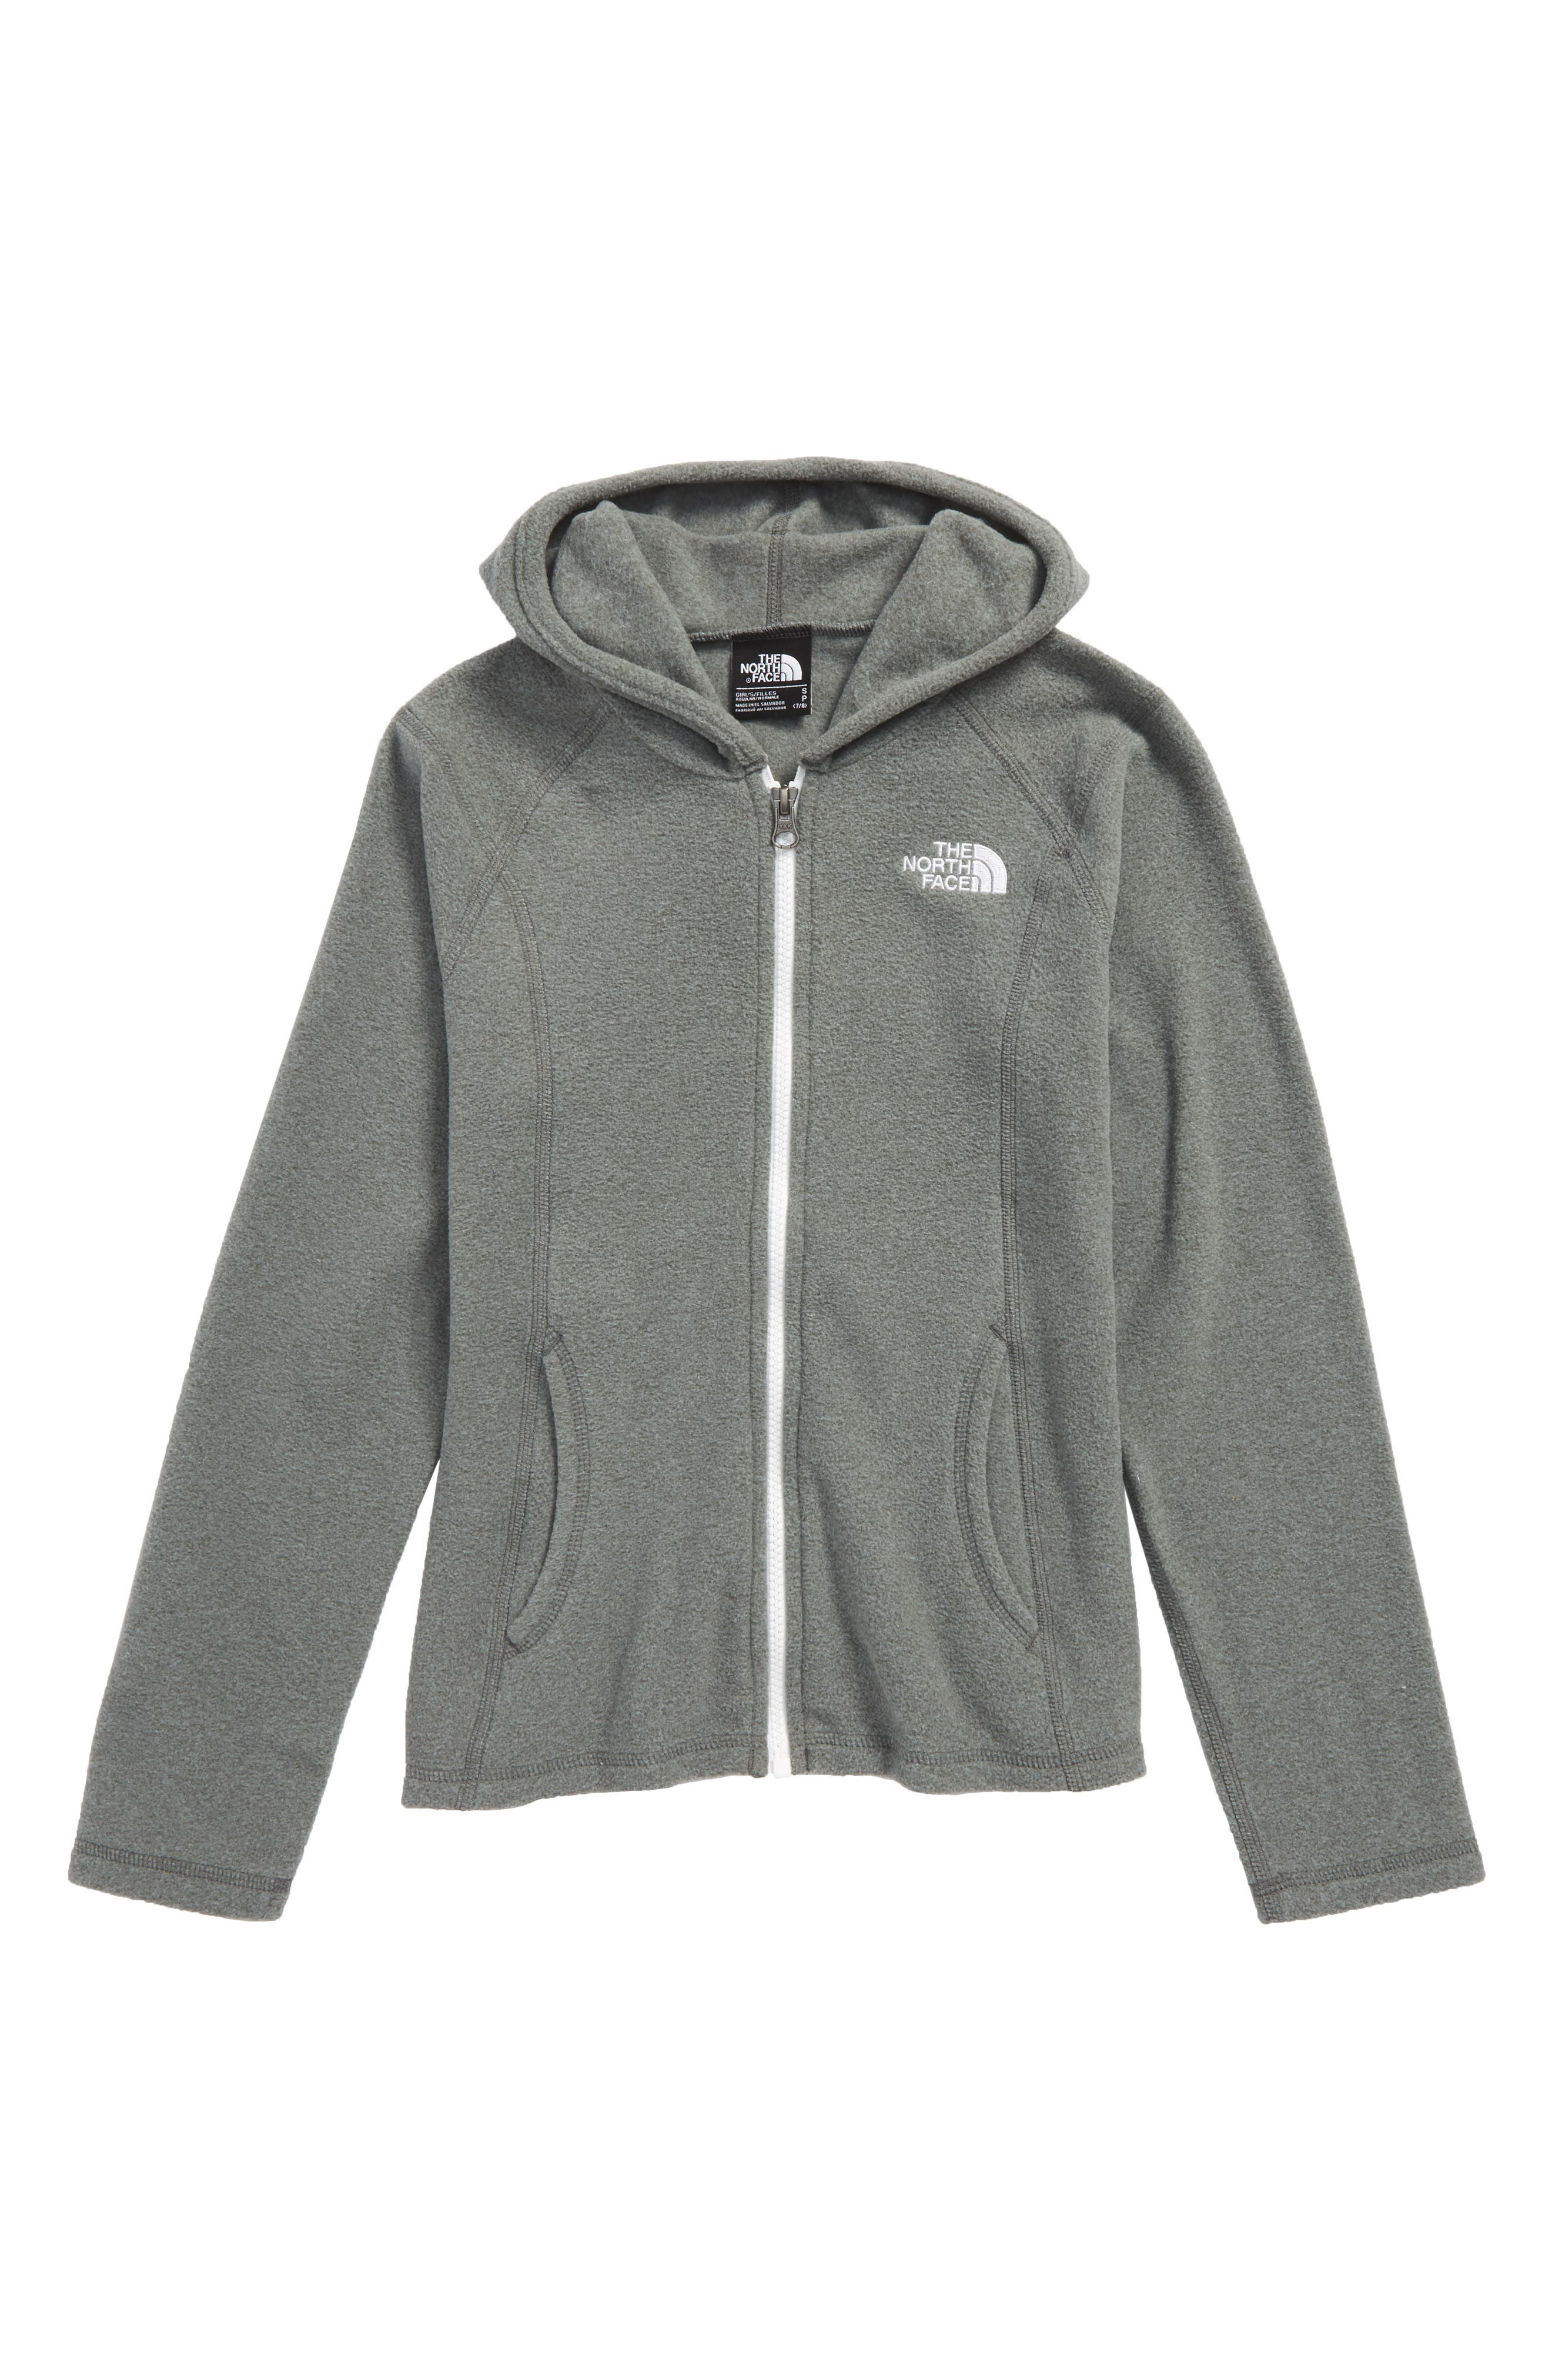 Glacier Full Zip Fleece Hoodie,                         Main,                         color, Medium Grey Heather/ White